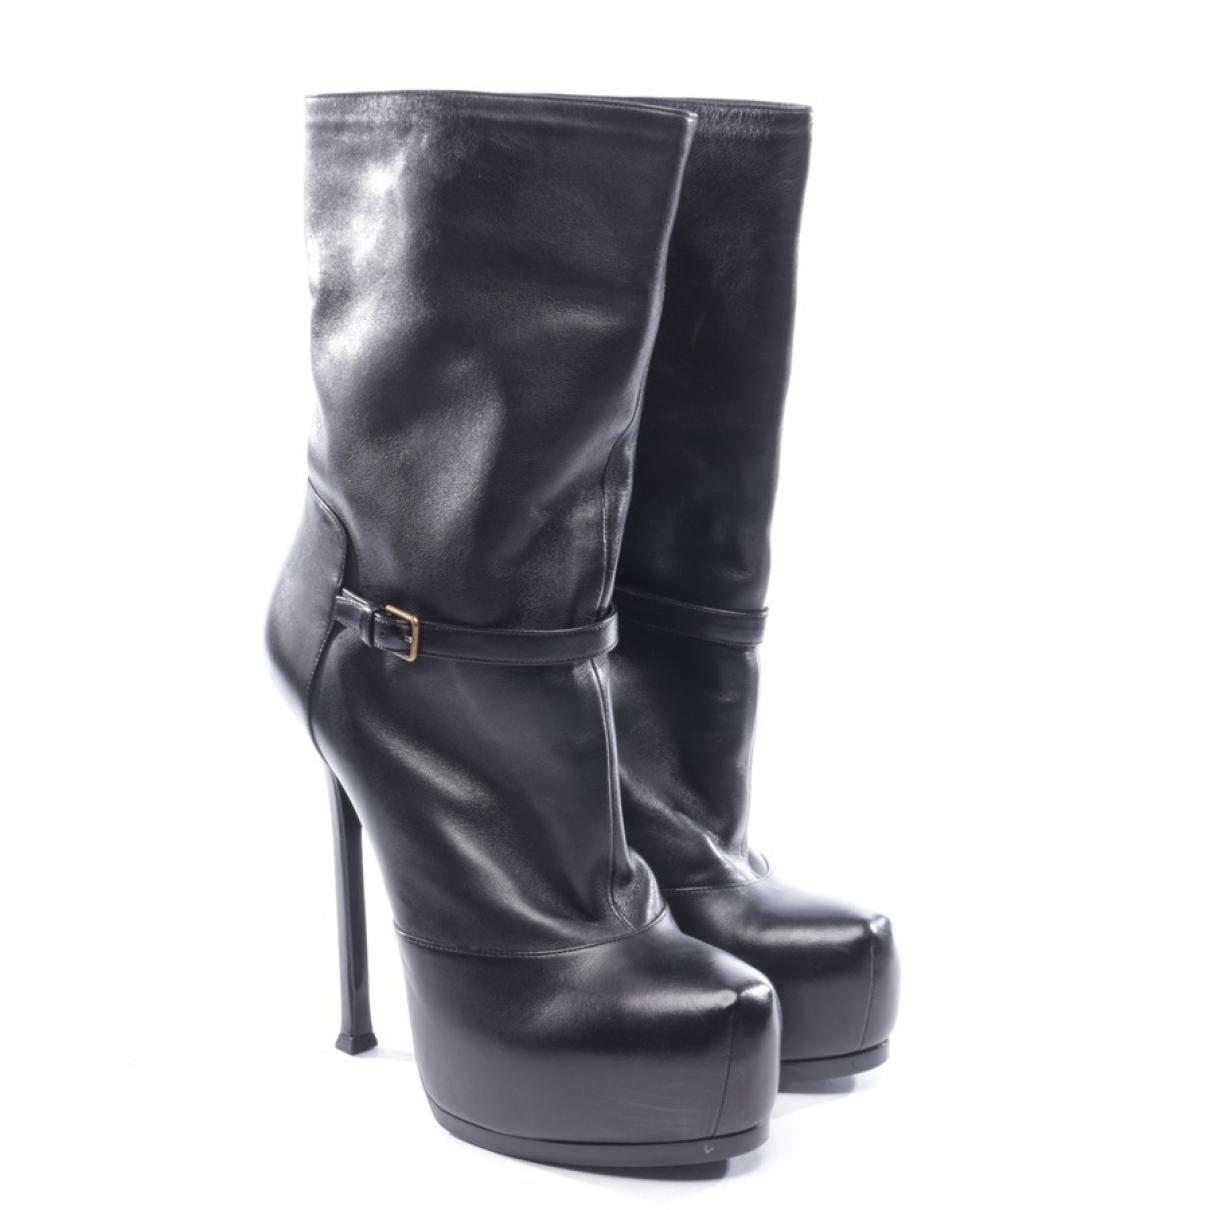 Yves Saint Laurent \N Stiefel in  Schwarz Leder